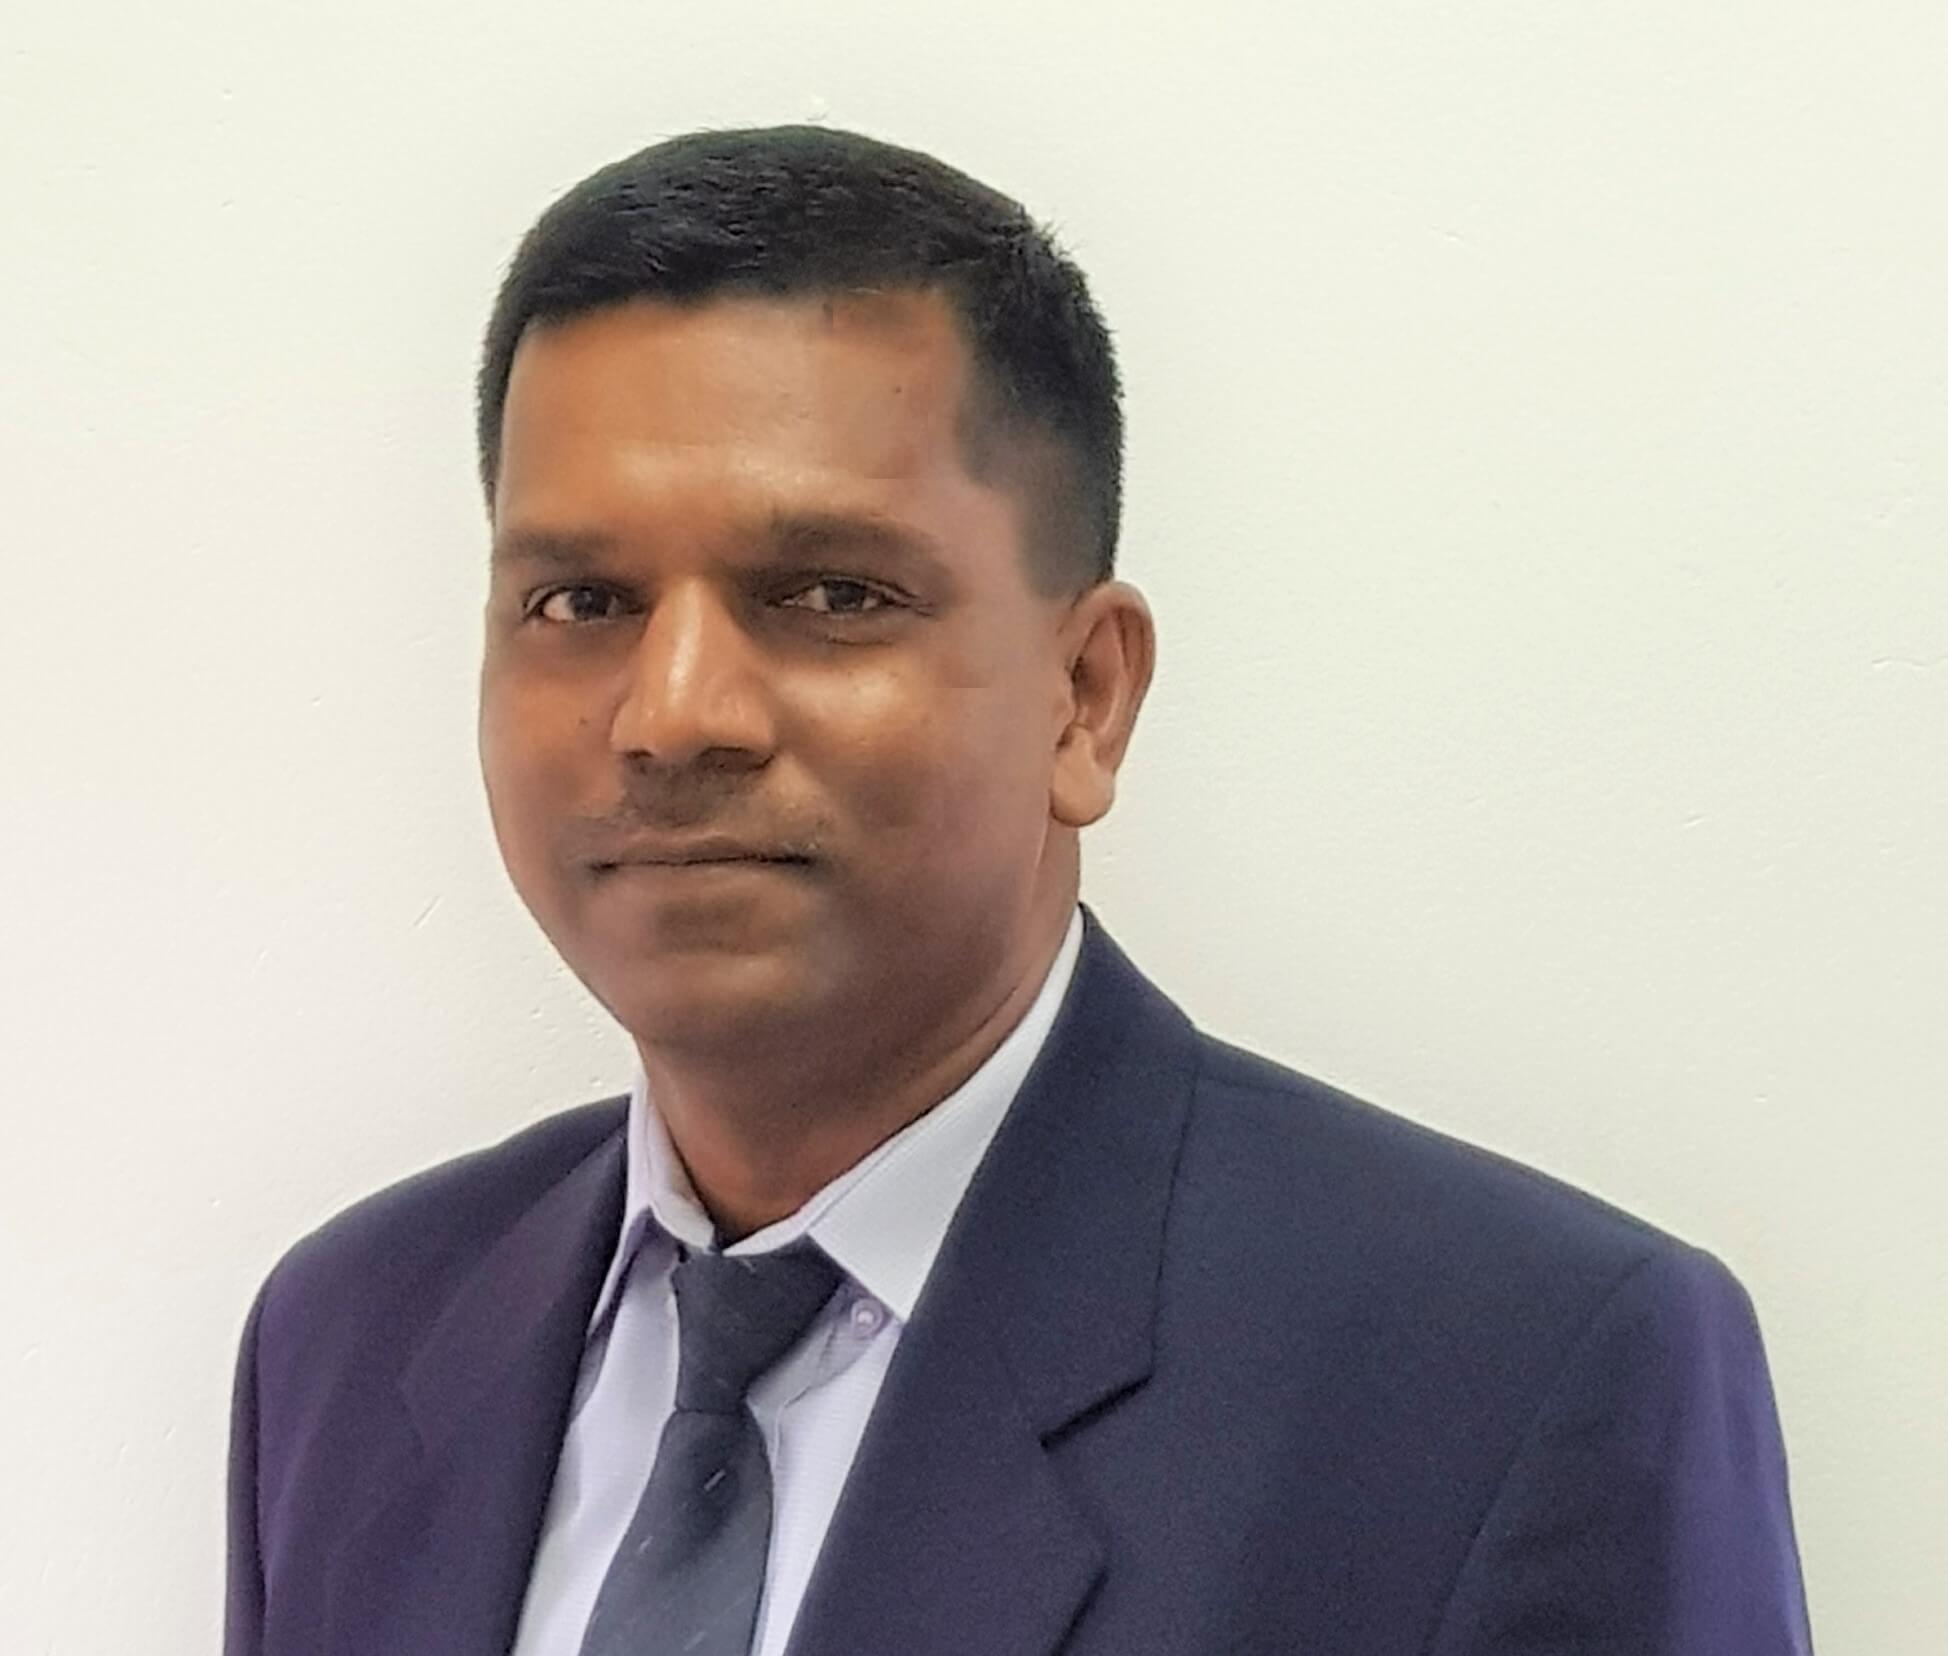 Mr. Sunil Chaudhary